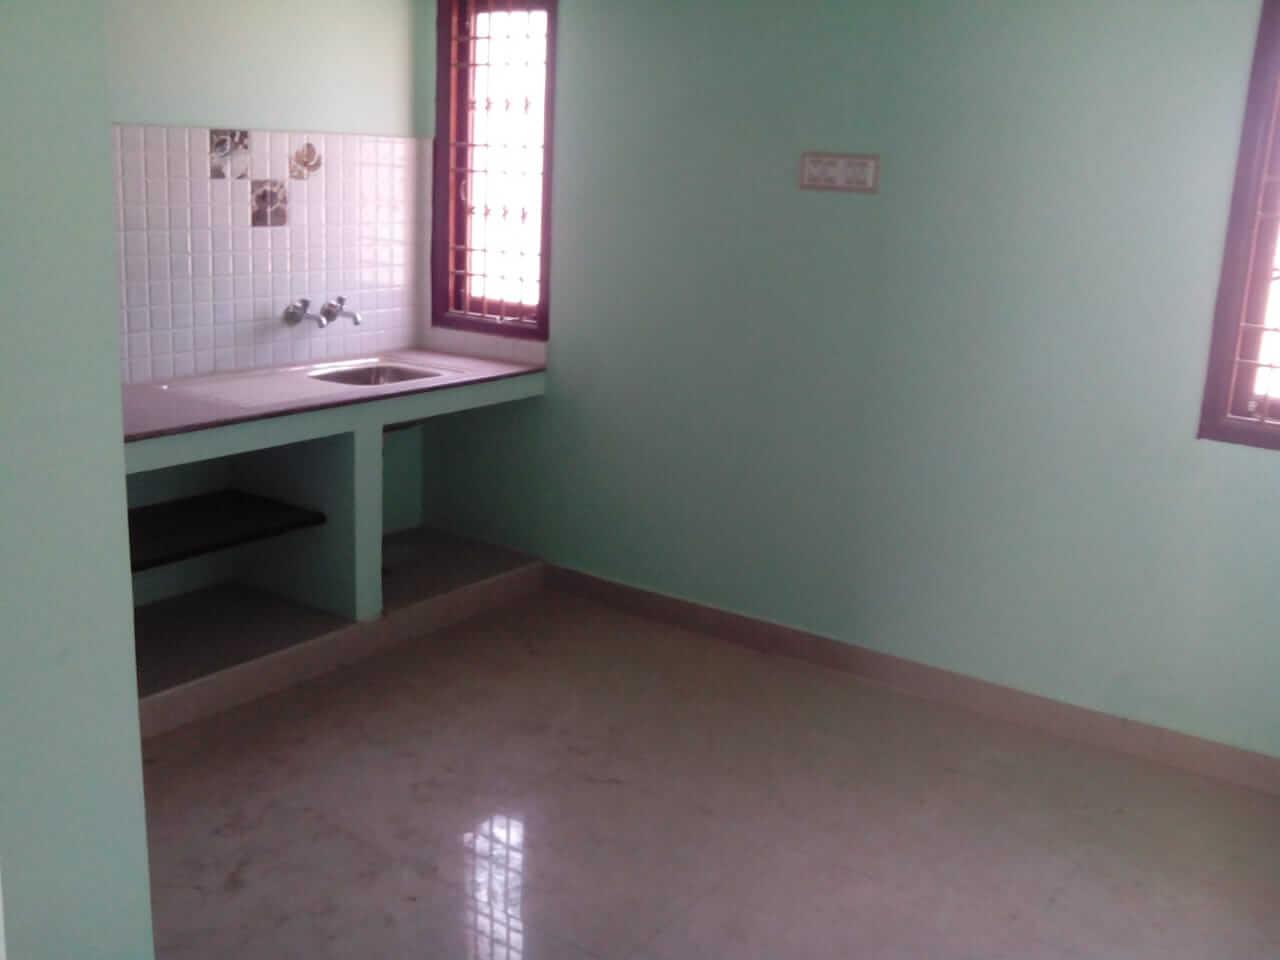 2 BHK Apartment / Flat for Rent 1100 Sq. Feet at Chennai, Seneerkupam